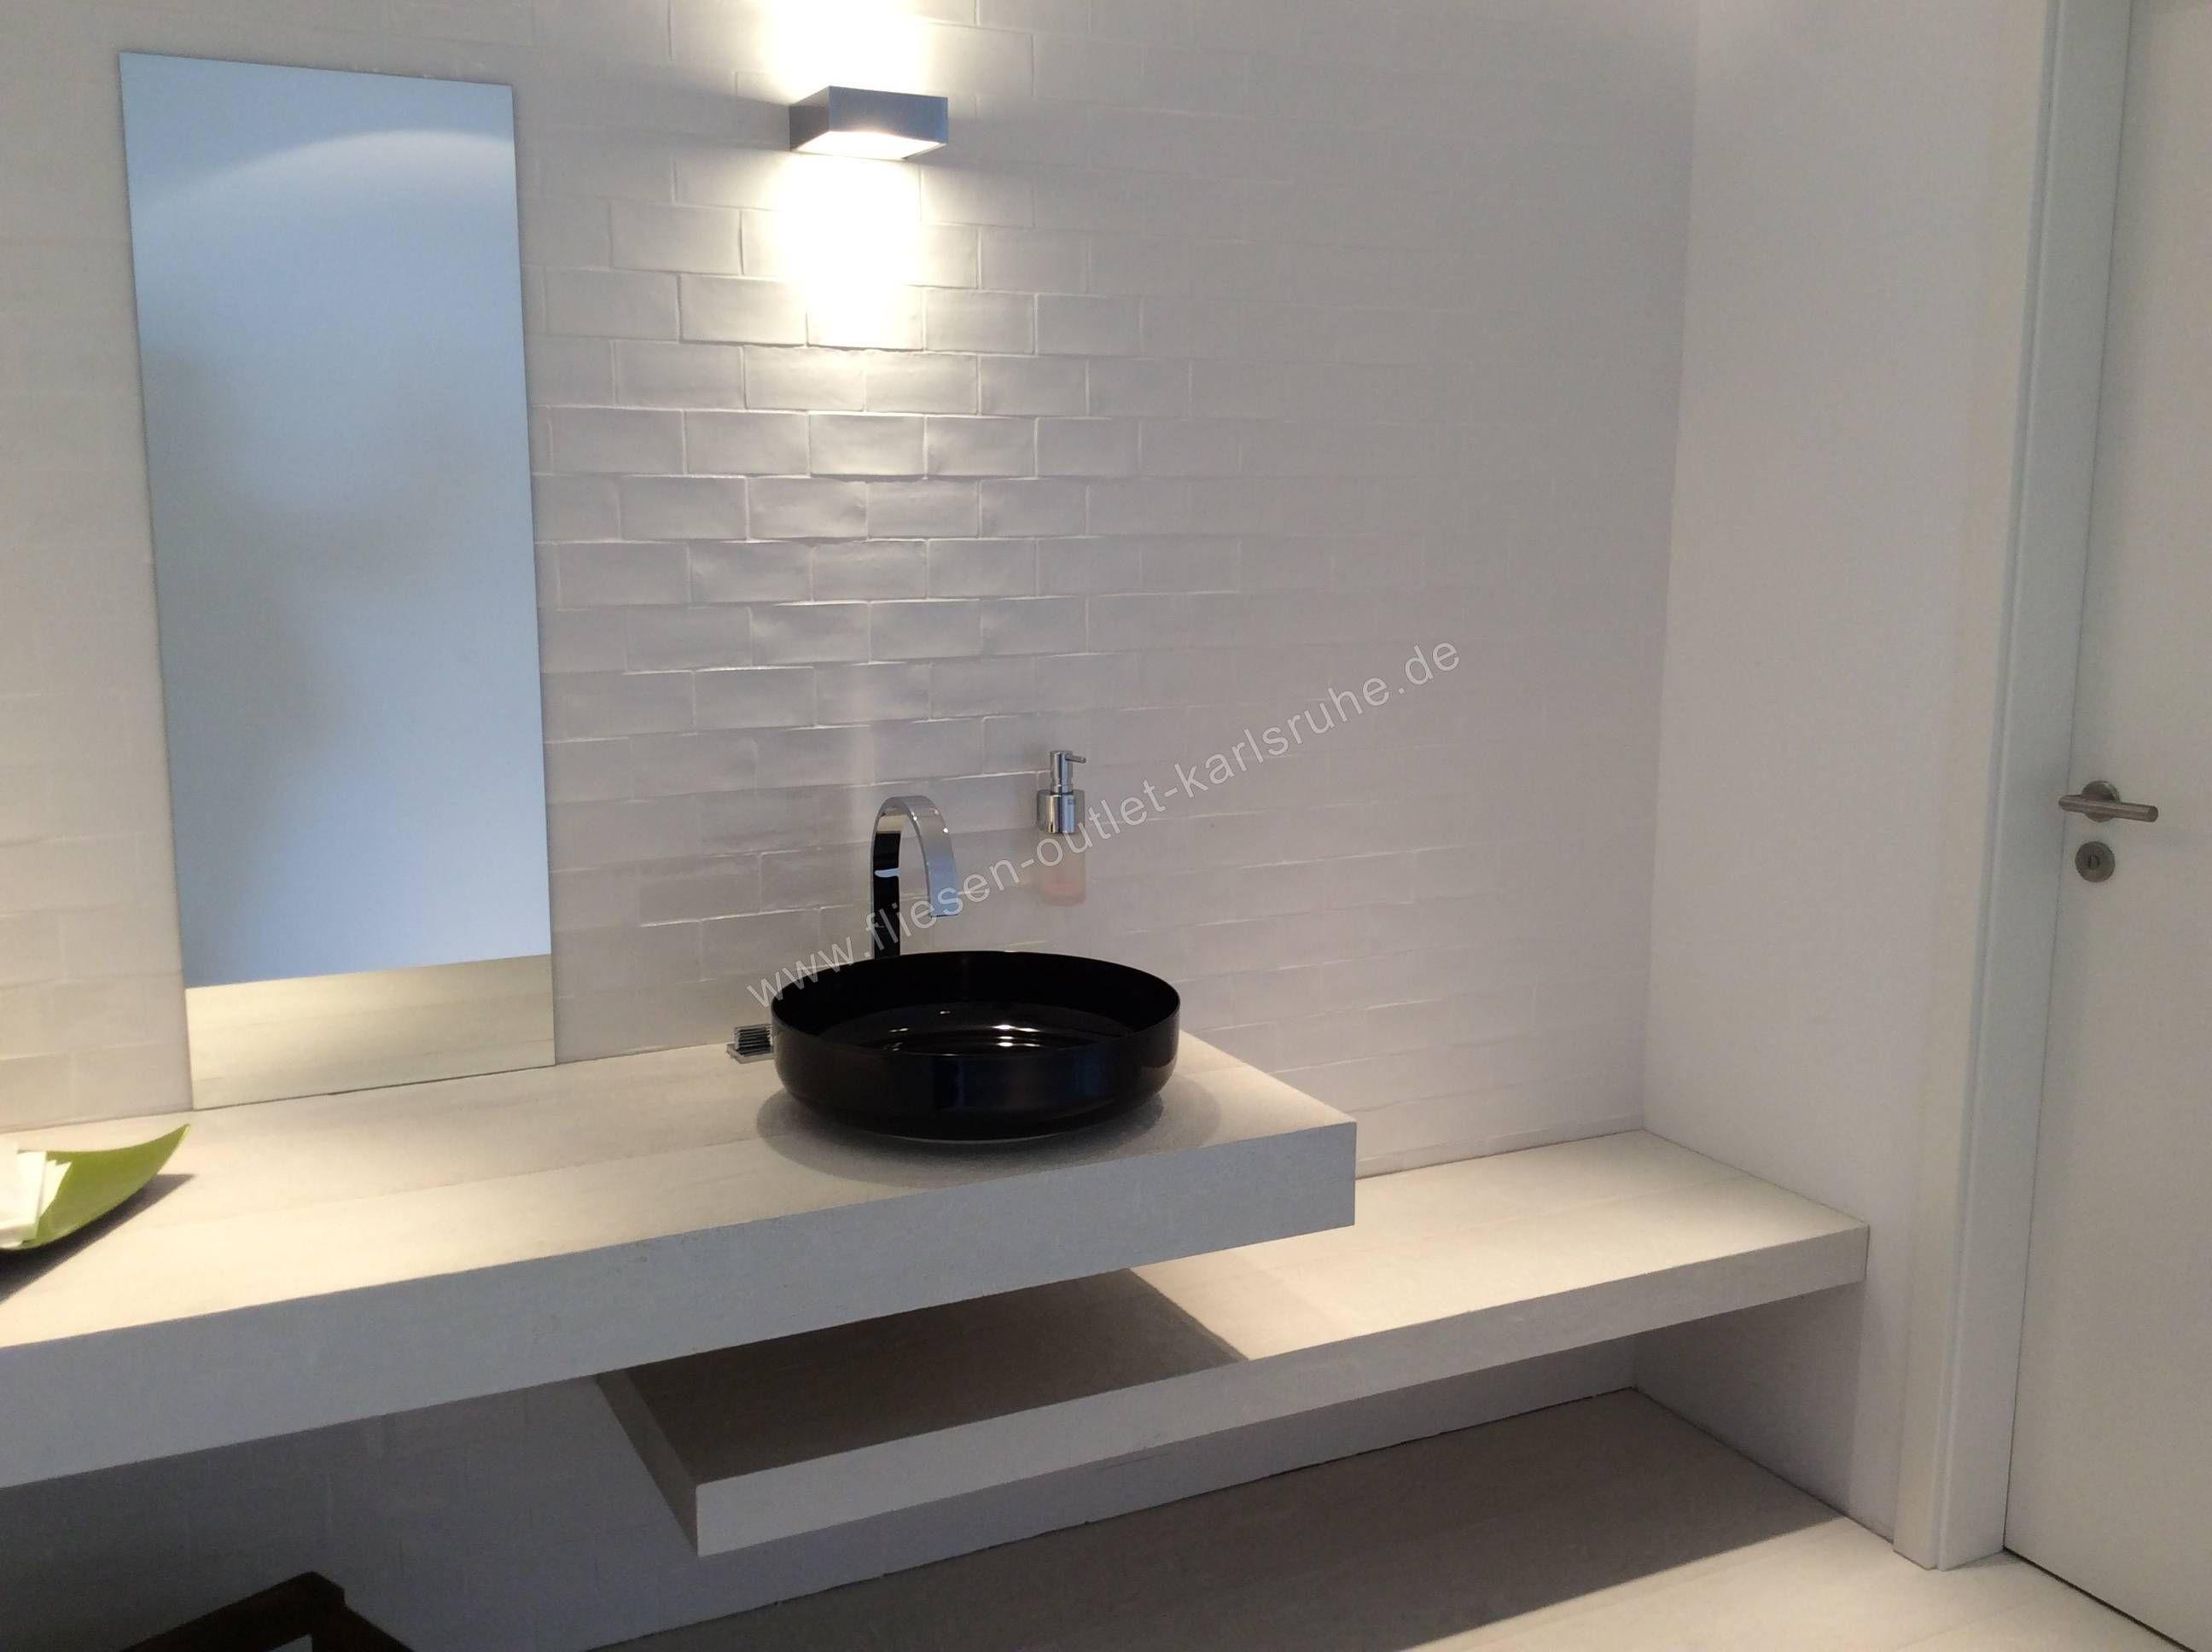 Betonbrick Wall 7 5x15 Cm White In 2019 Fliesen Wall Bathroom